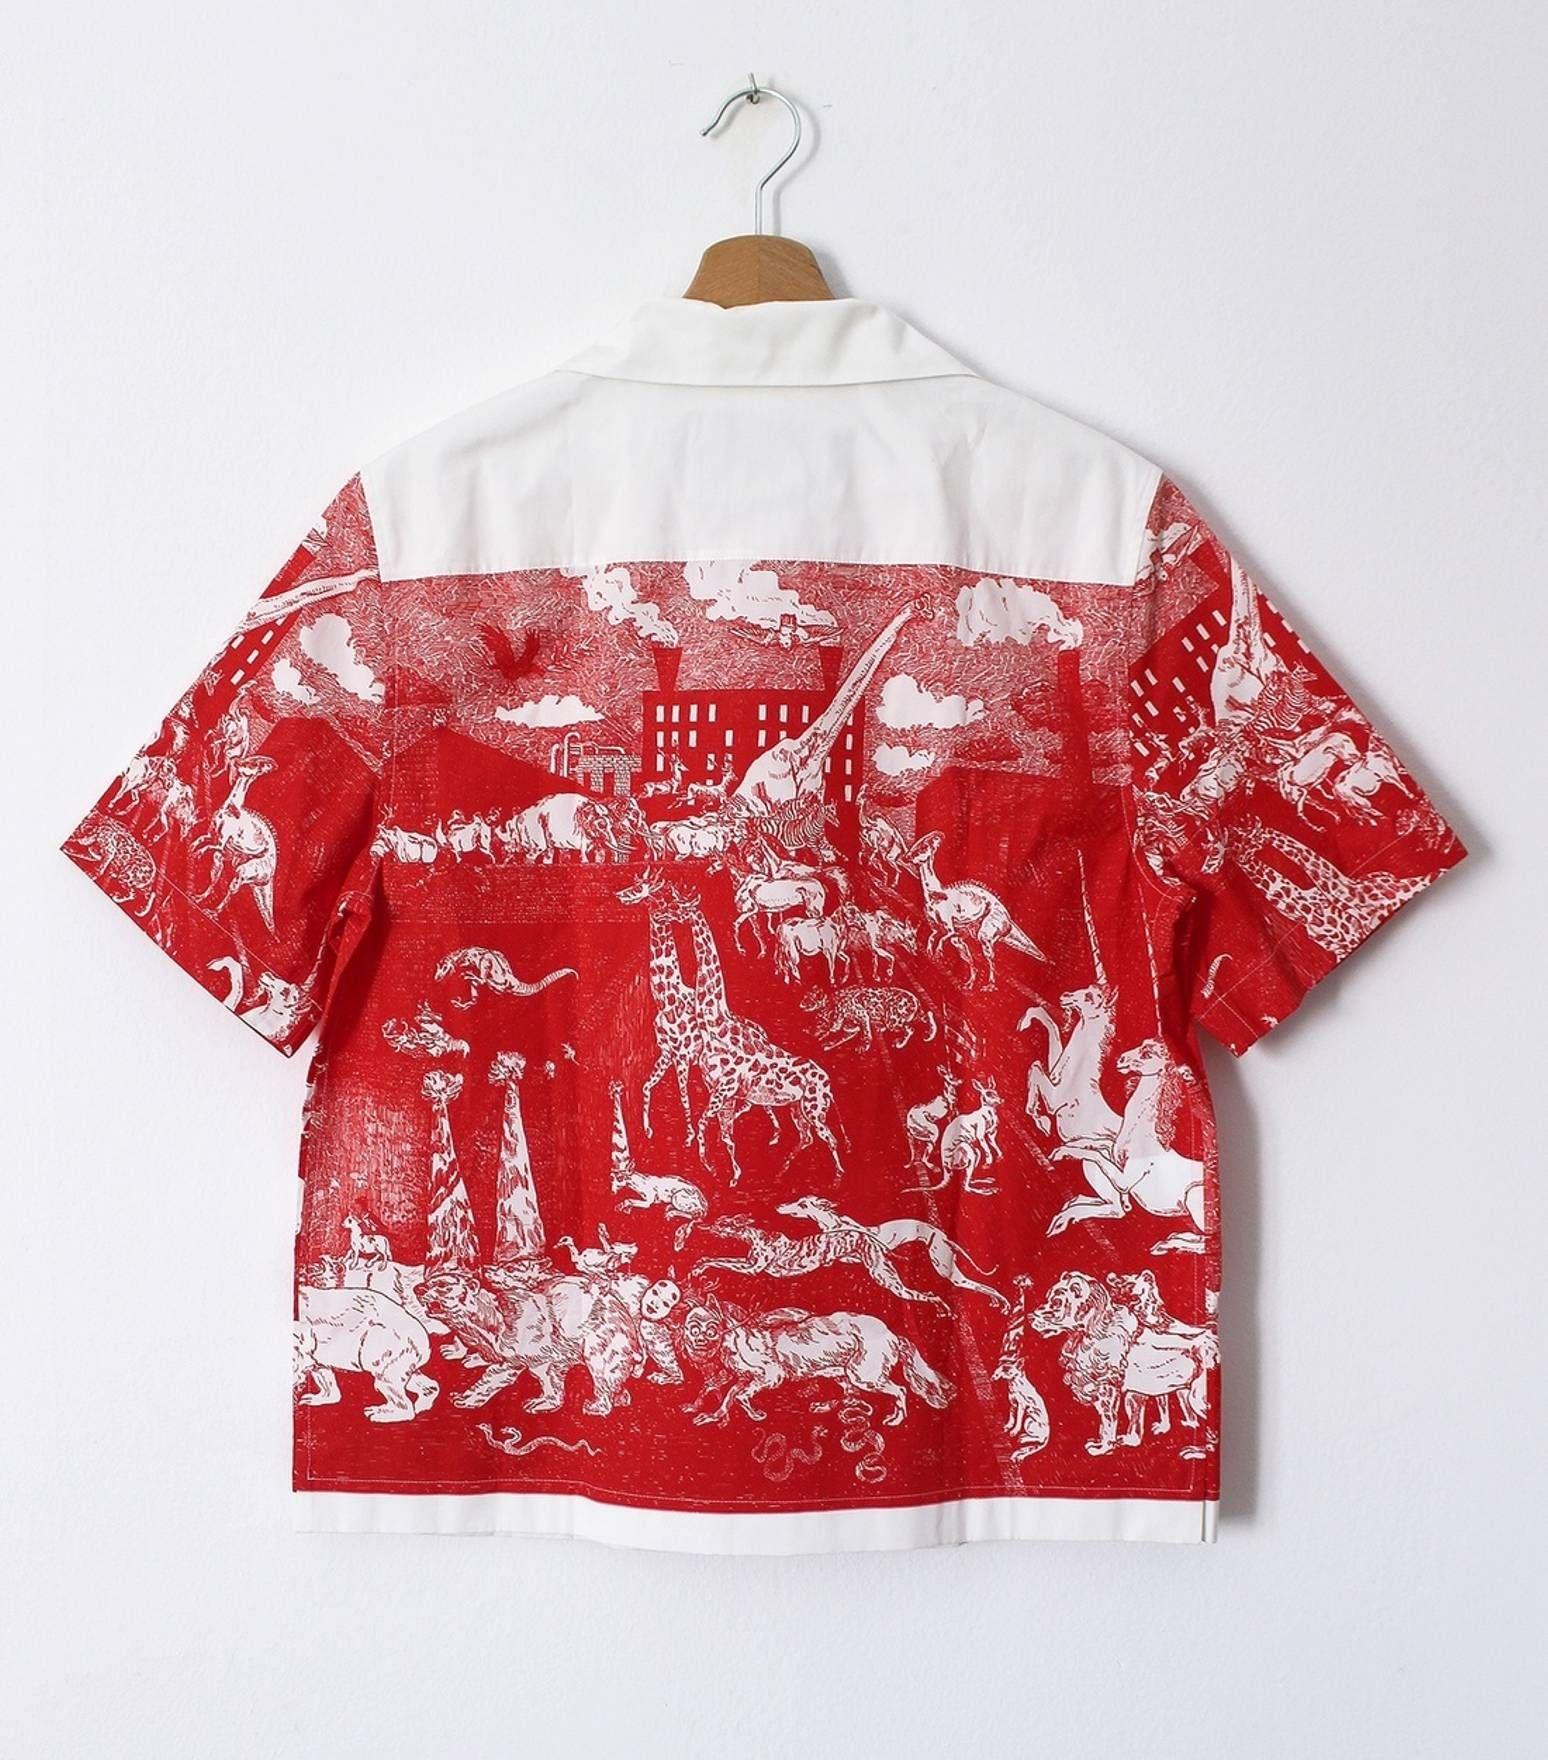 Prada Bnwt Aw 16 17 Christophe Chemin Print Shirt Size Us M Eu 48 Andrew Smith Floral Printed Navy Xxl